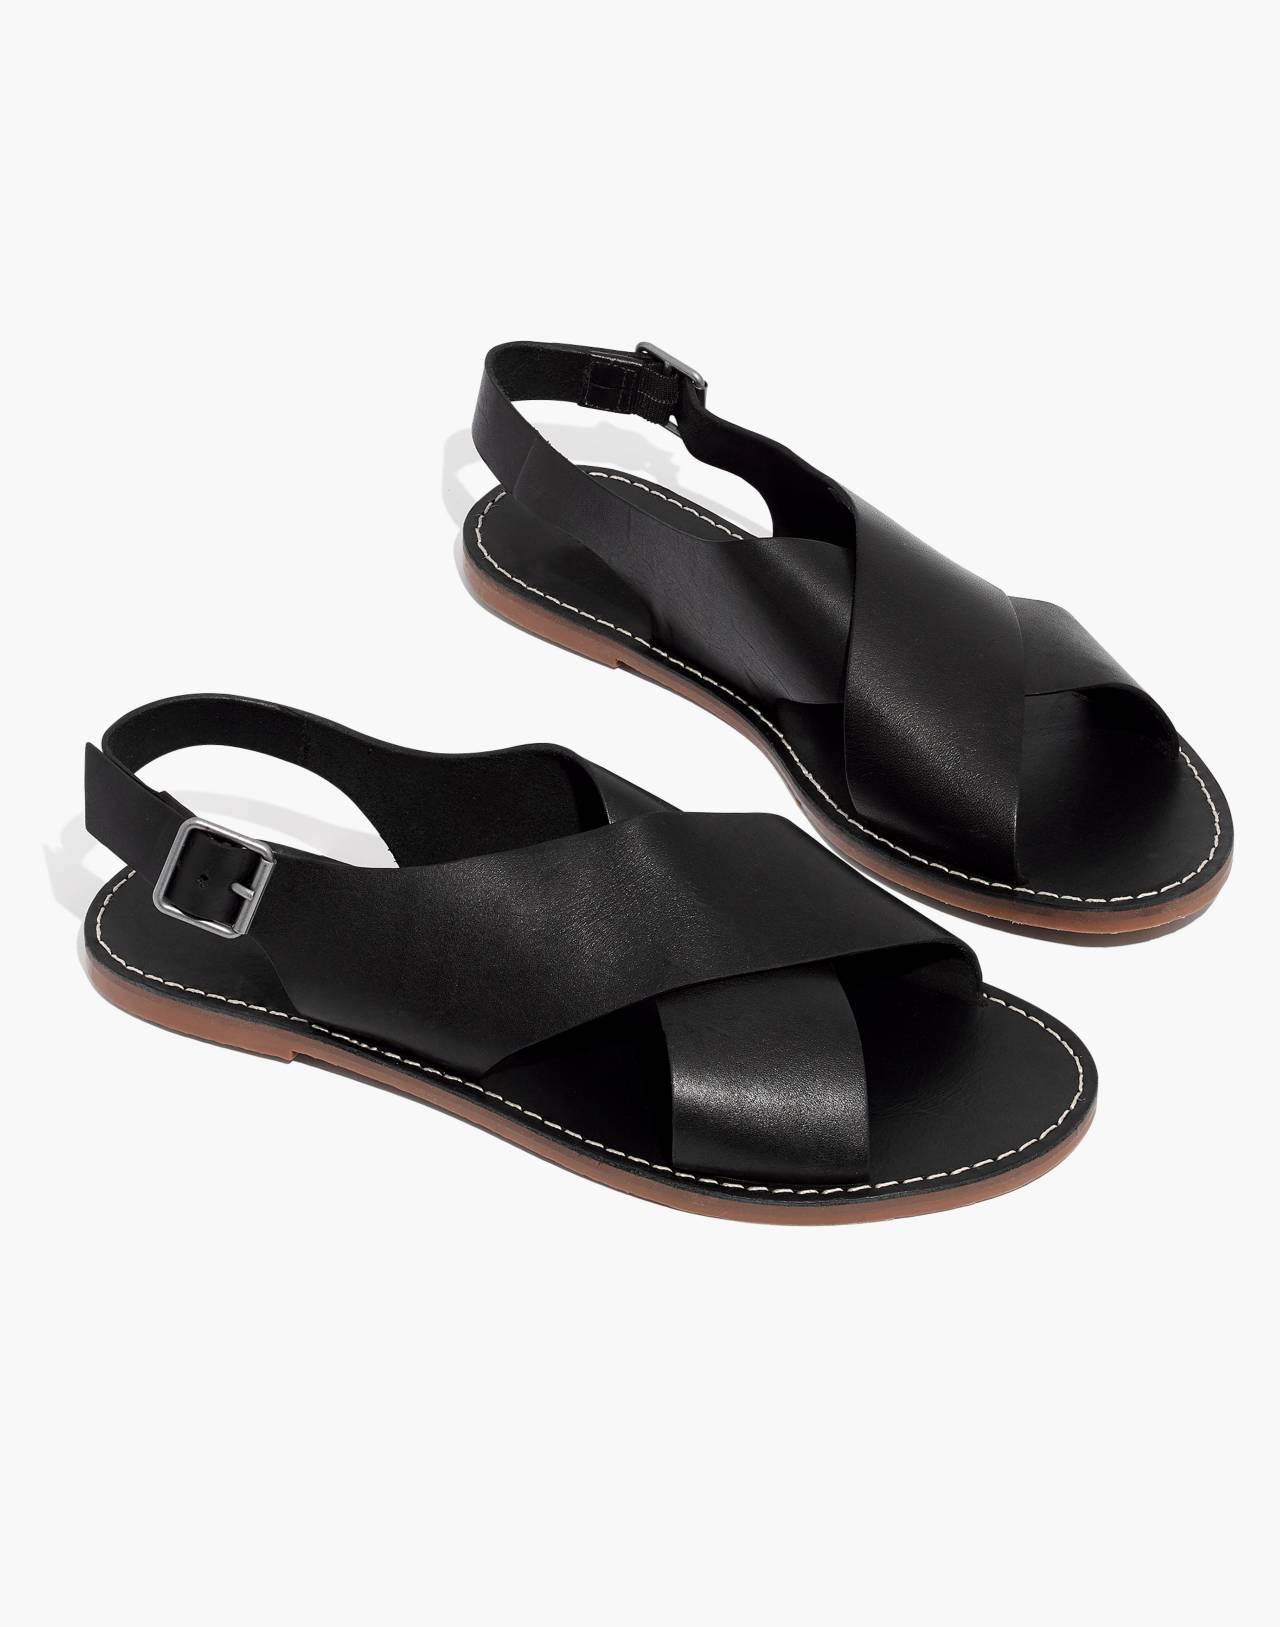 The Boardwalk Crossover Sandal in true black image 1